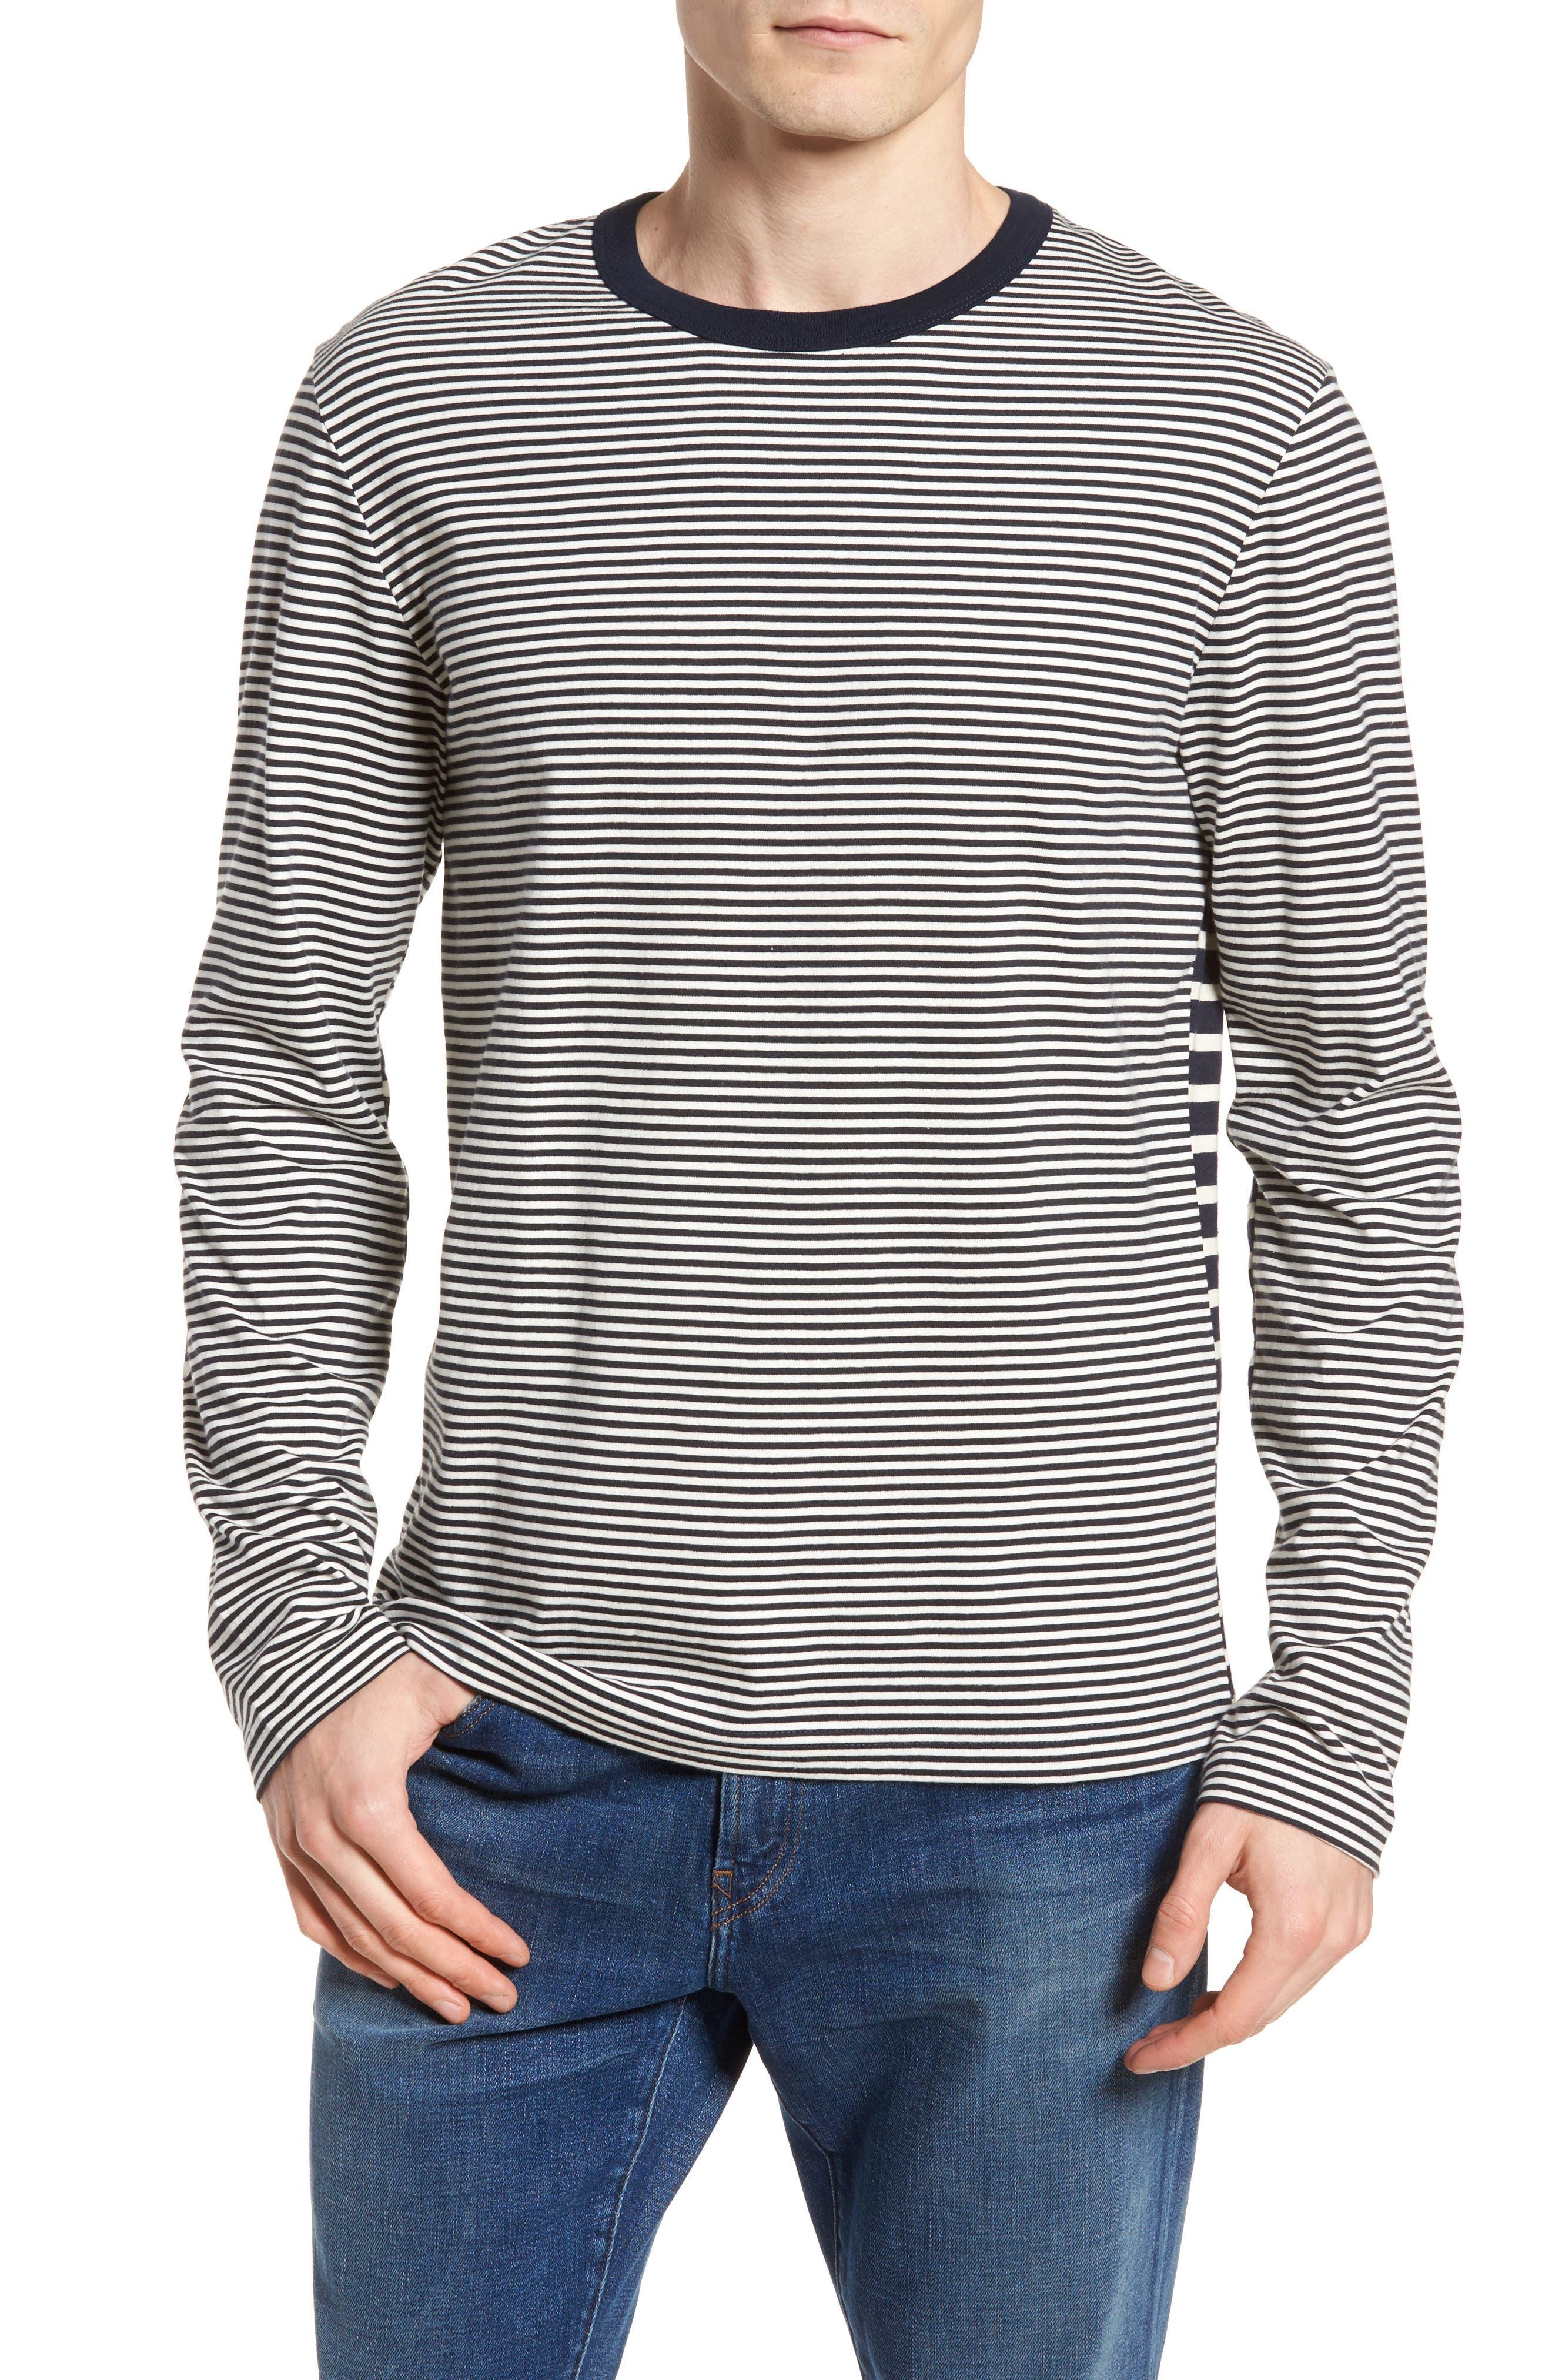 Mix Stripe Long Sleeve T-Shirt,                         Main,                         color, Turtle Dove/ Marine Blue